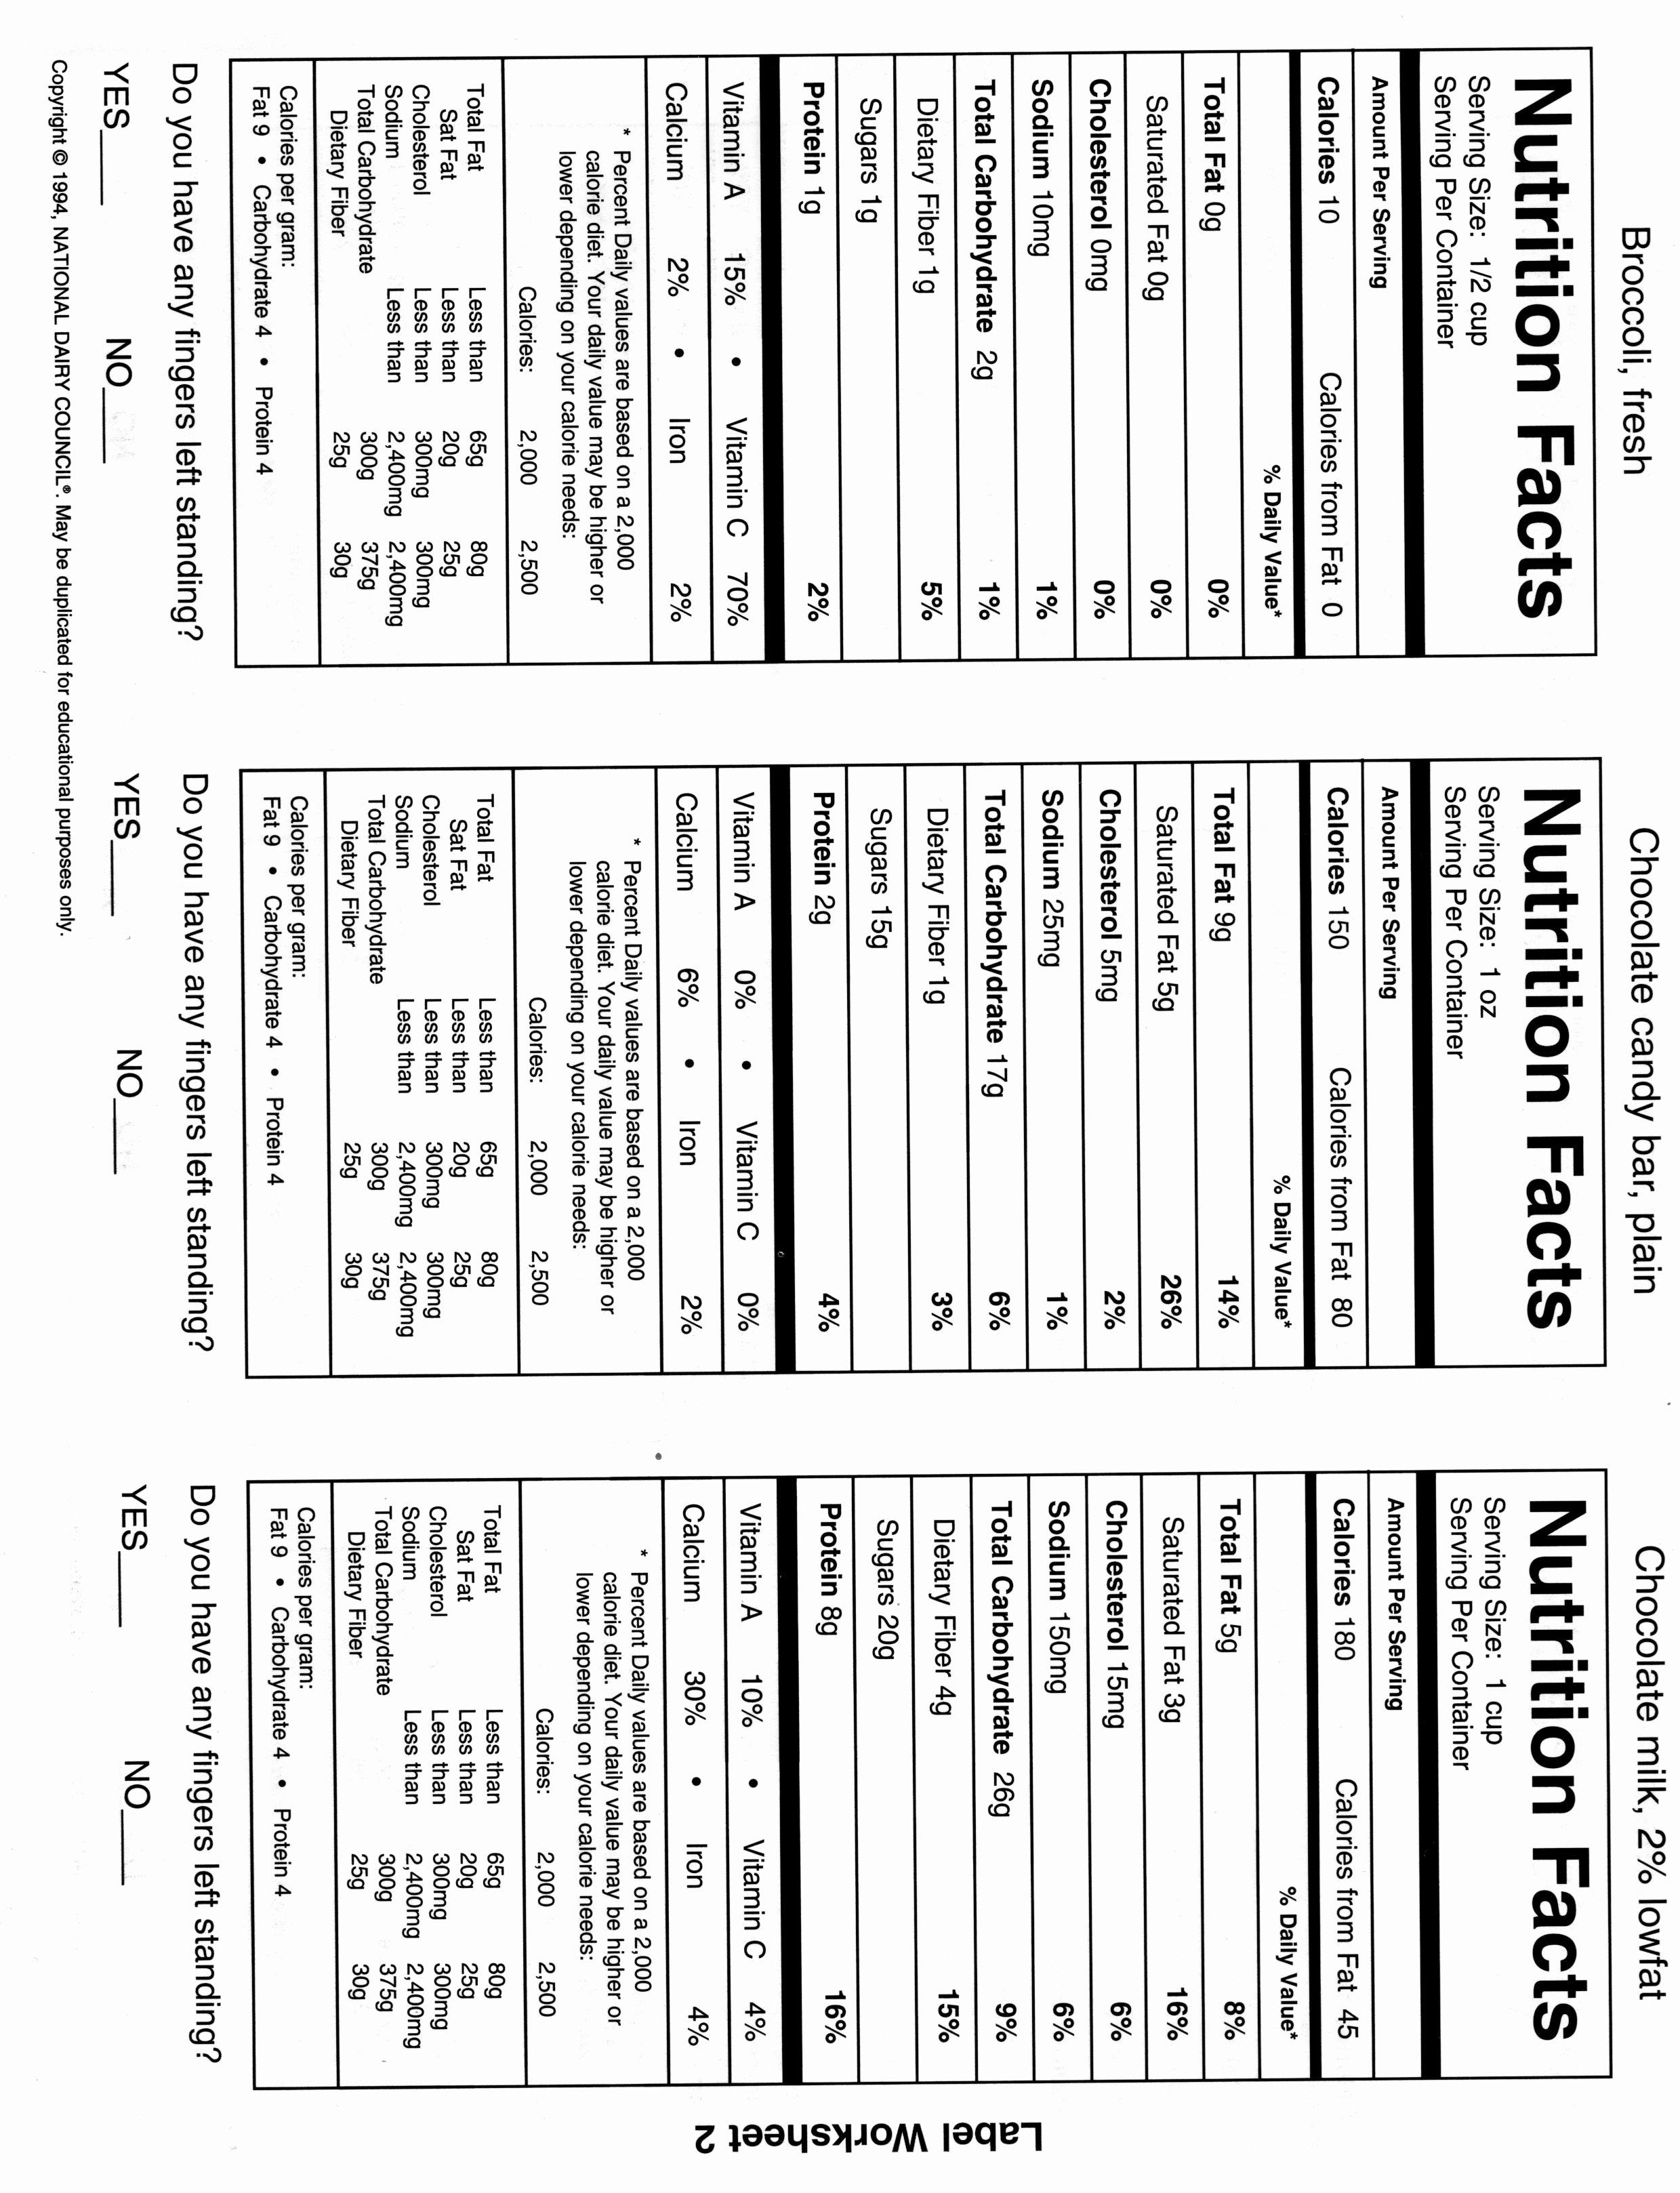 Blank Nutrition Label Worksheet Awesome 16 Best Of Nutrition Label Worksheet Printable